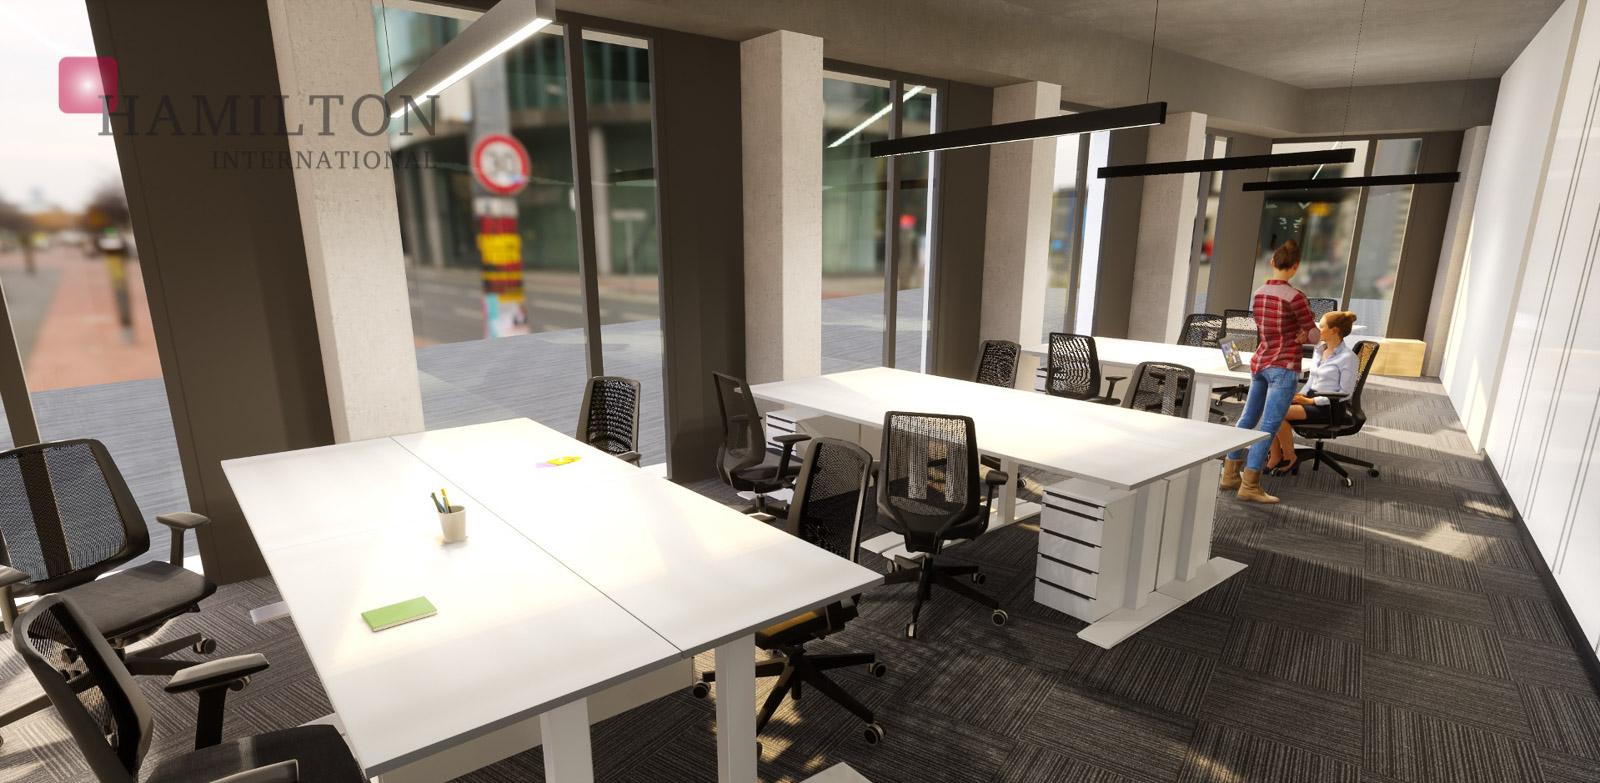 CitySpace Beethovena Warszawa serviced lease term main photo